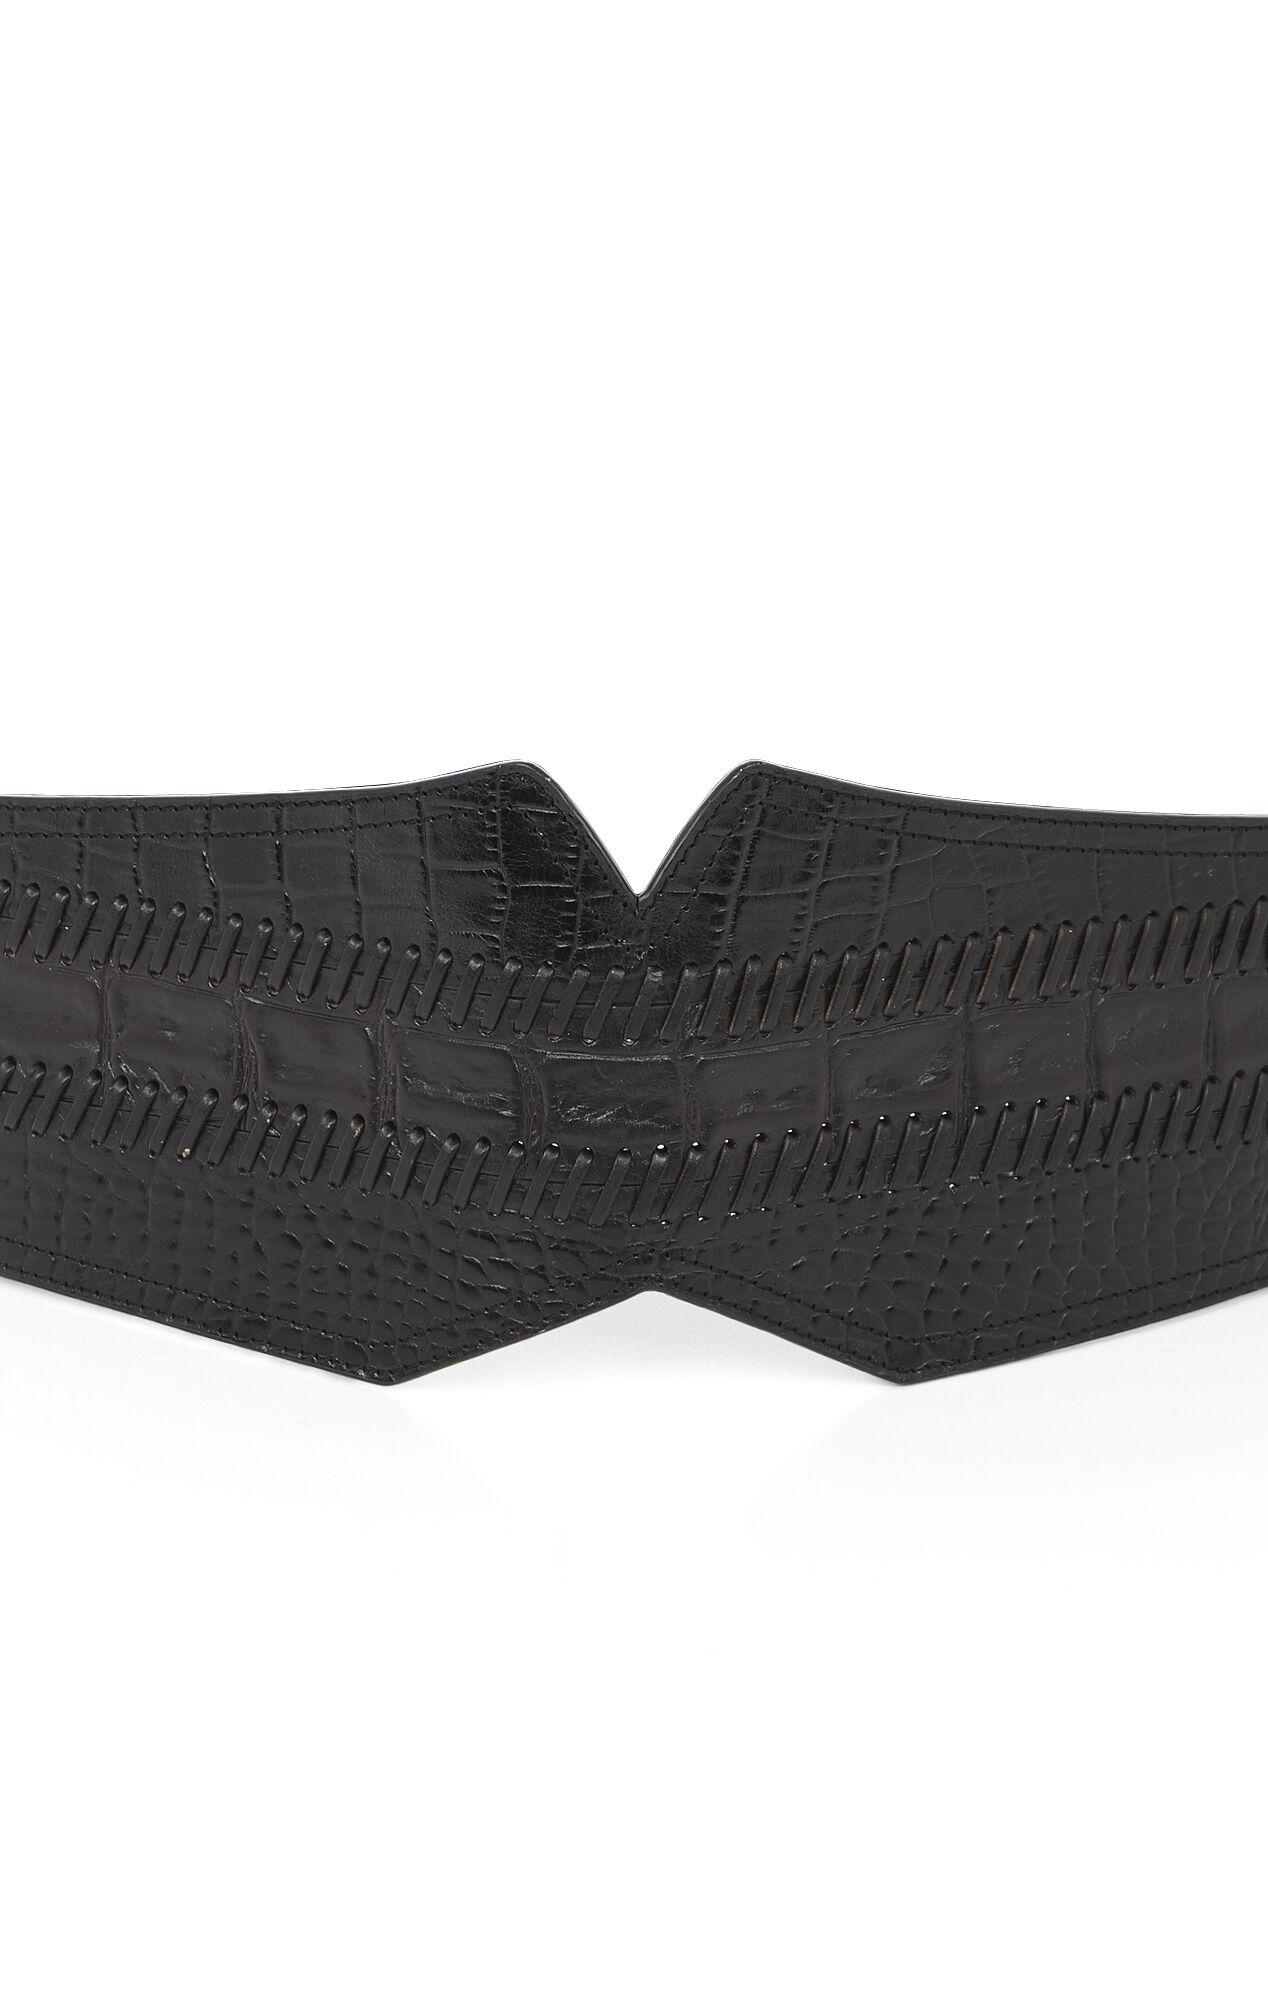 Large Croco Belt